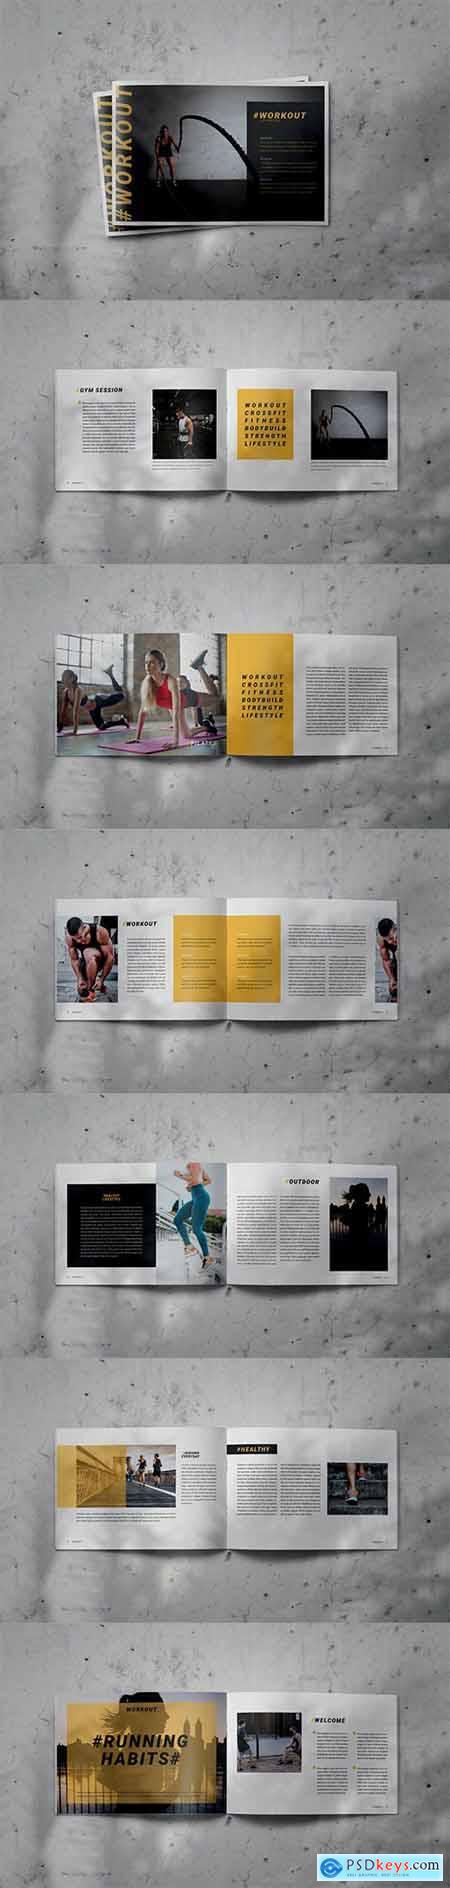 WORKOUT - Indesign Brochure Lookbook Template